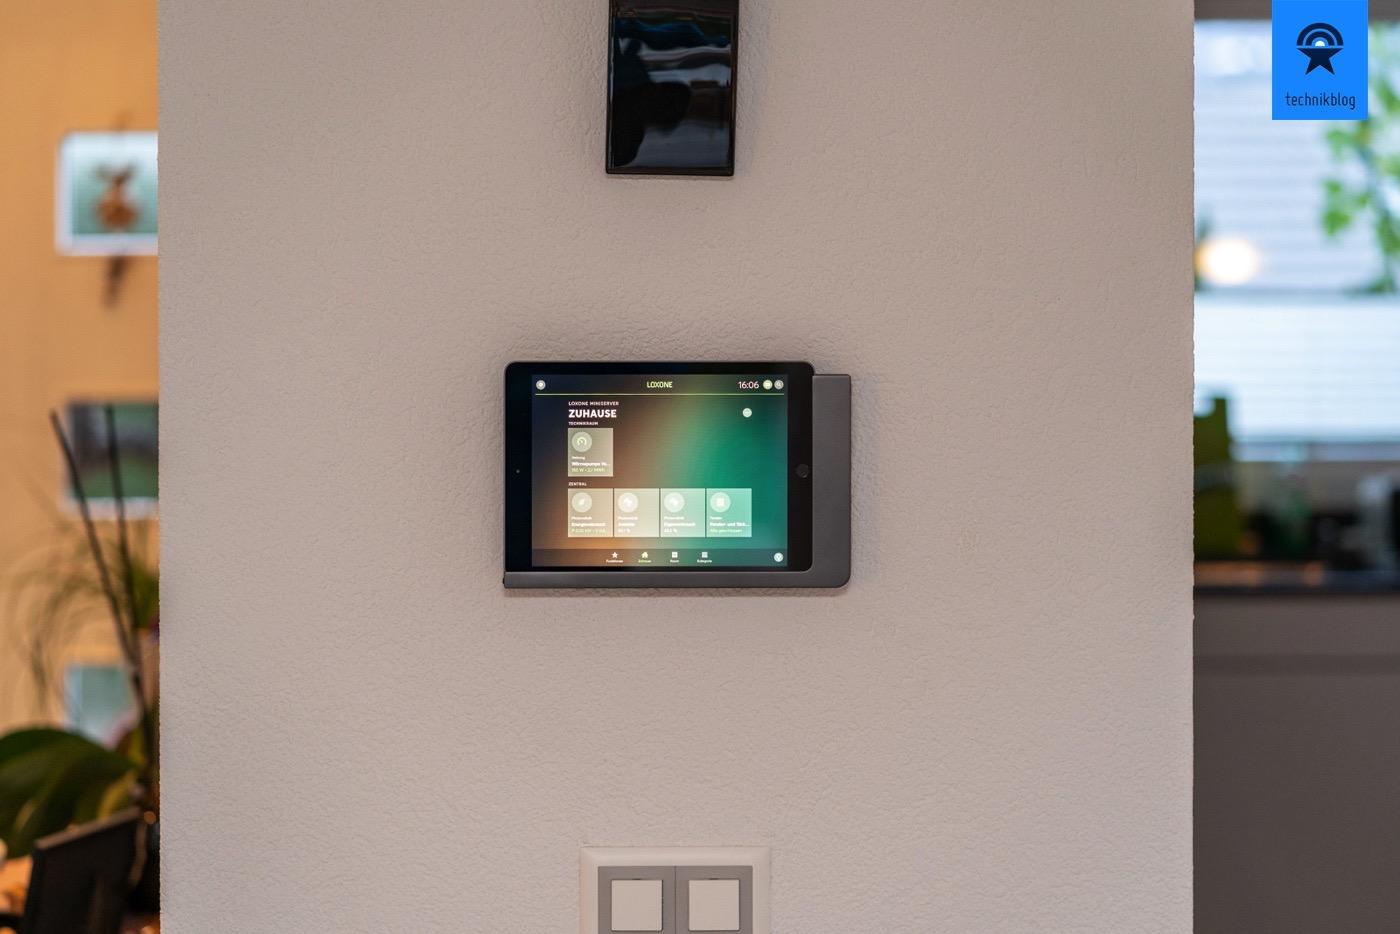 Viveroo Free als perfekte iPad Halterung im Smart Home